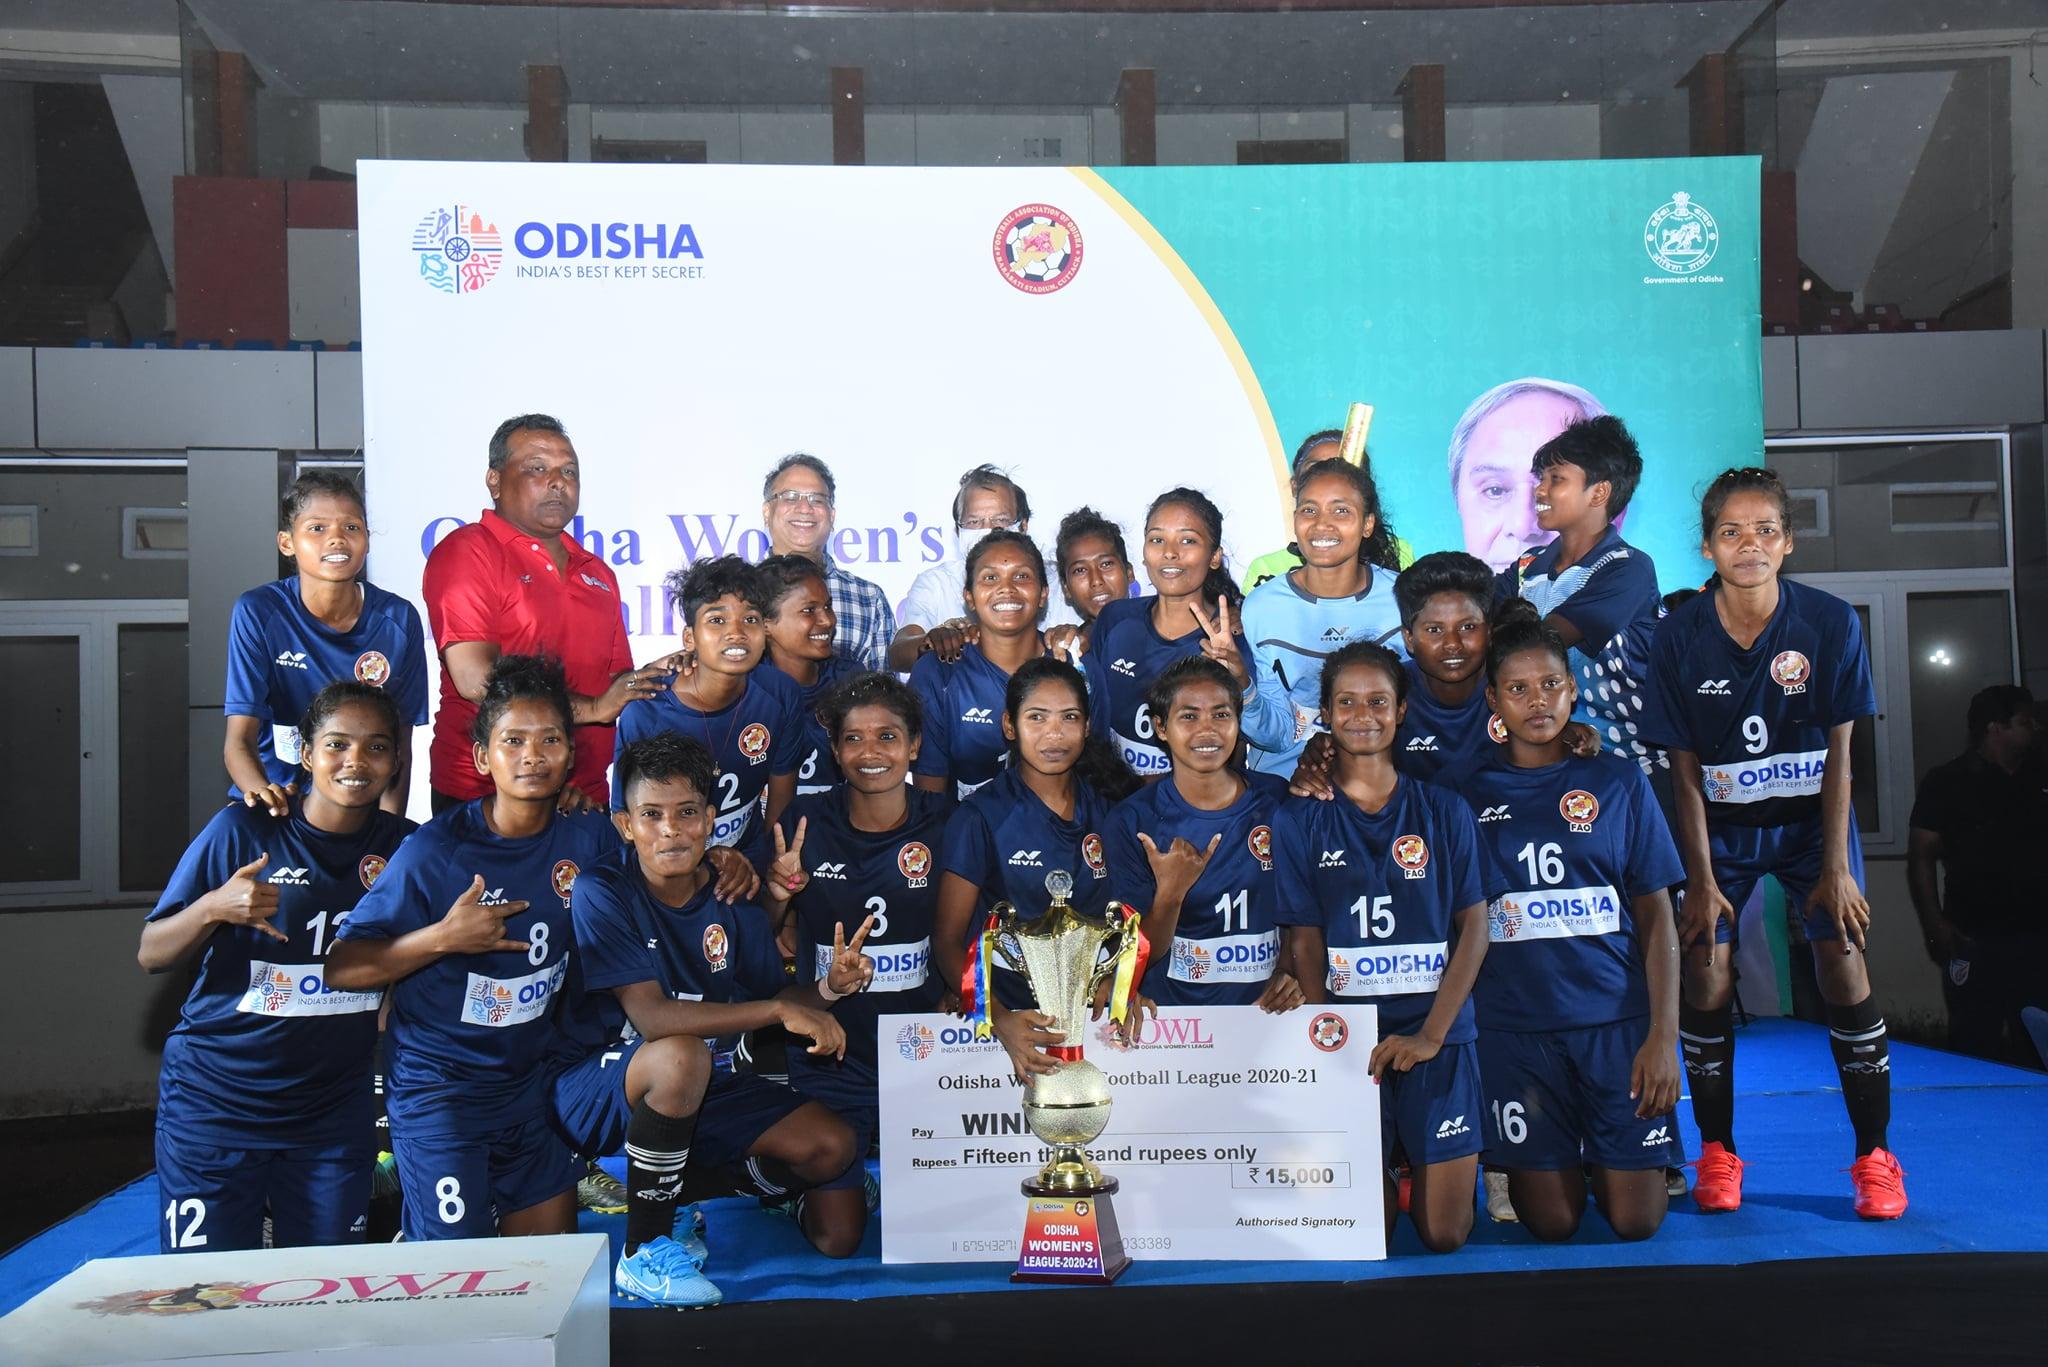 Odisha Women's League 2020-21 champions Rising Student's Club